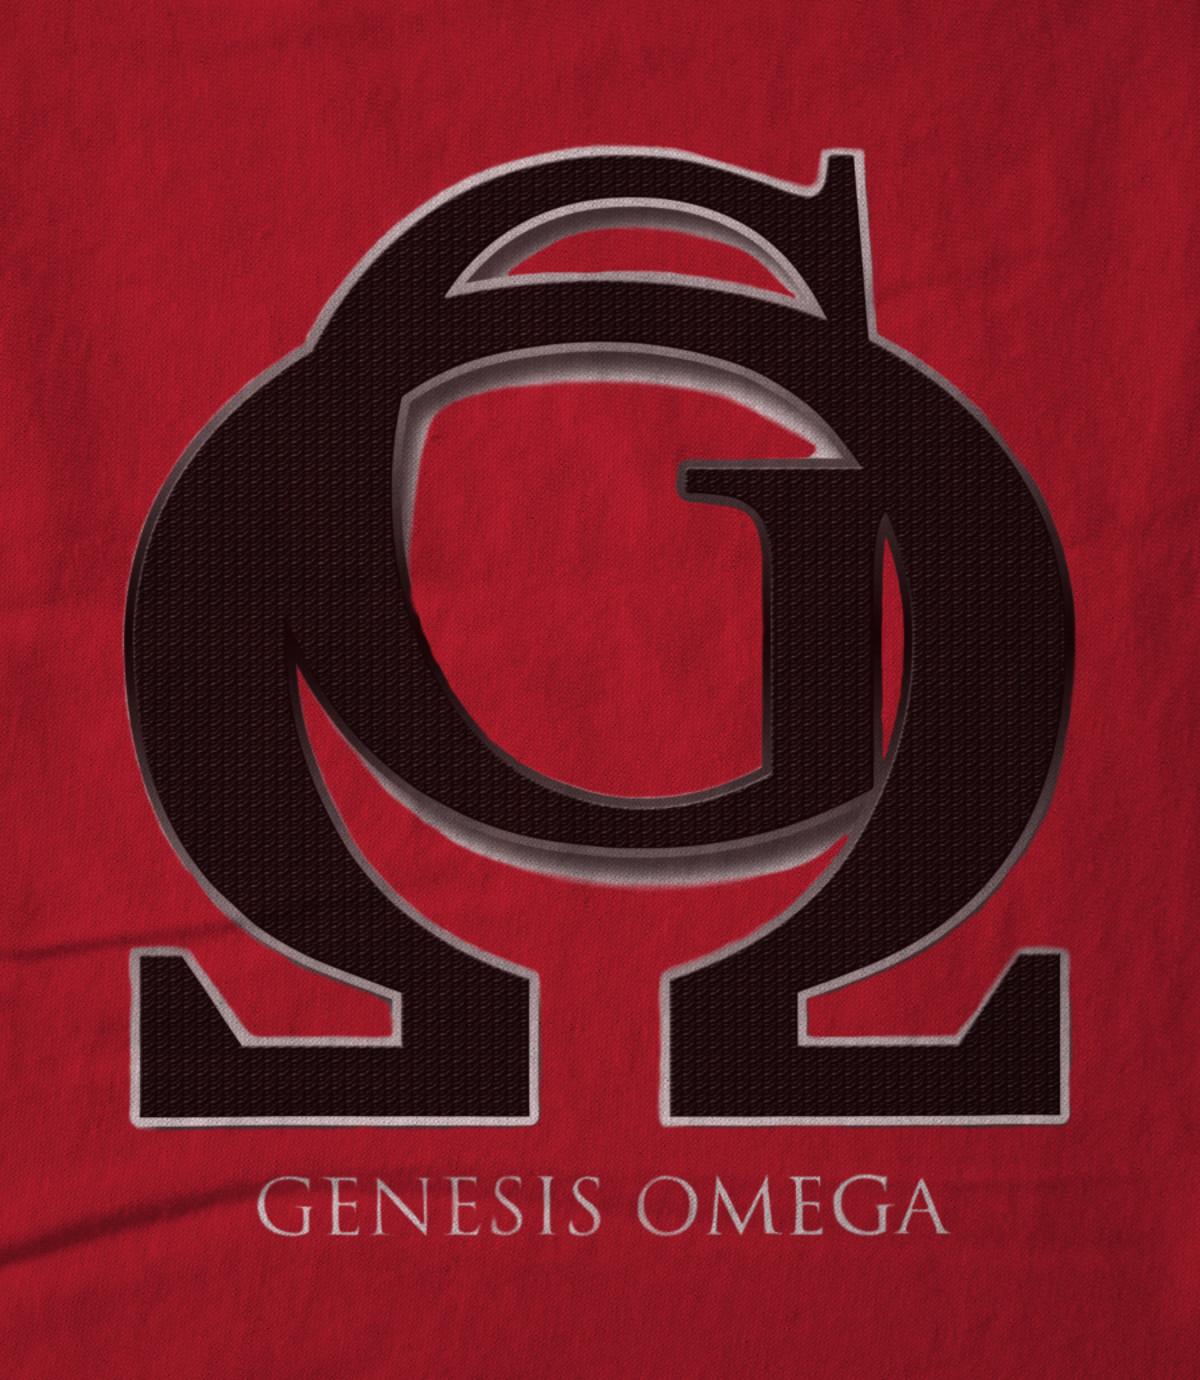 Genesis omega productions merch genesis omega productions genesis omega red 1494296381 buycottarizona